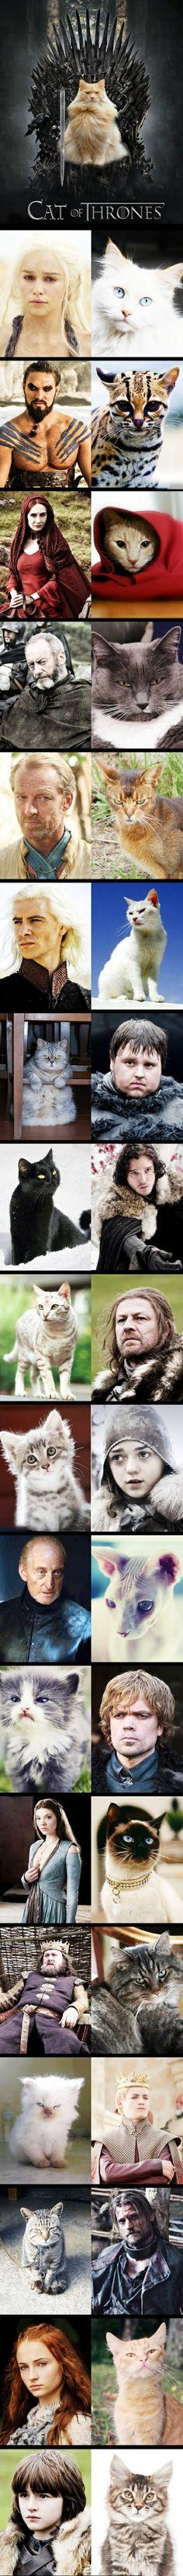 Cat of thrones :D